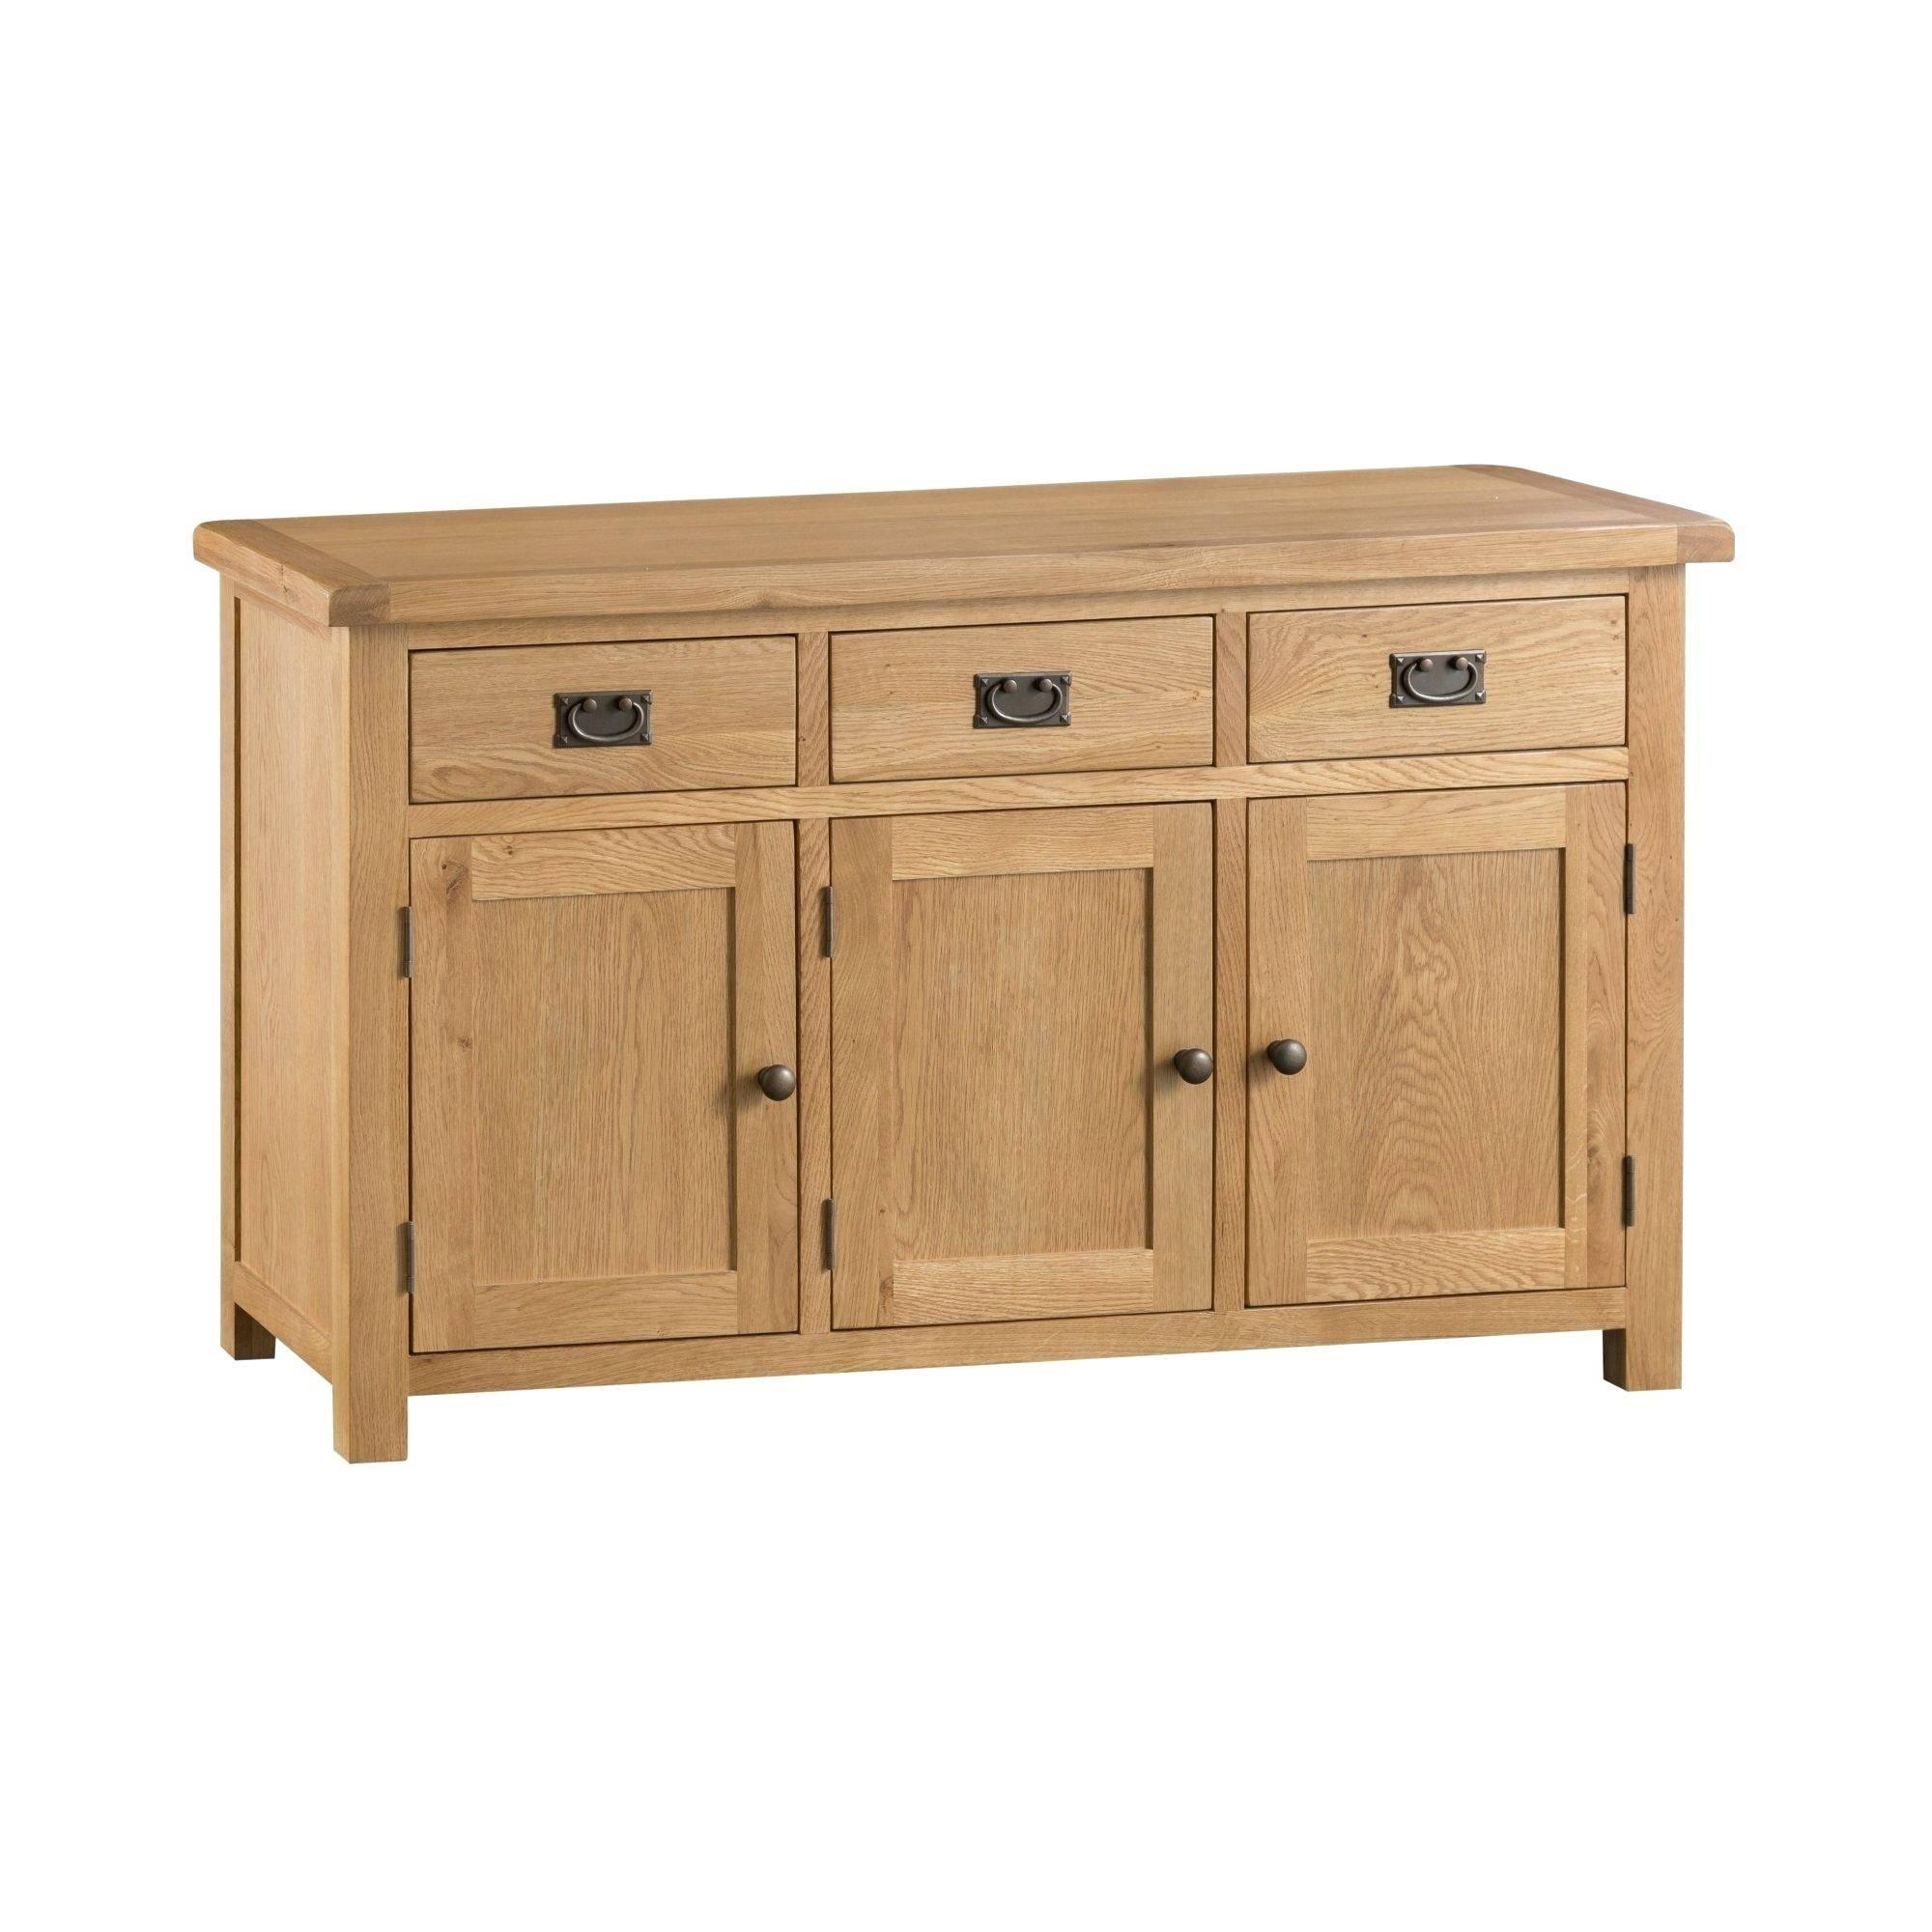 Large Sideboard Large Oak Sideboard Antique – Roborob (View 12 of 15)